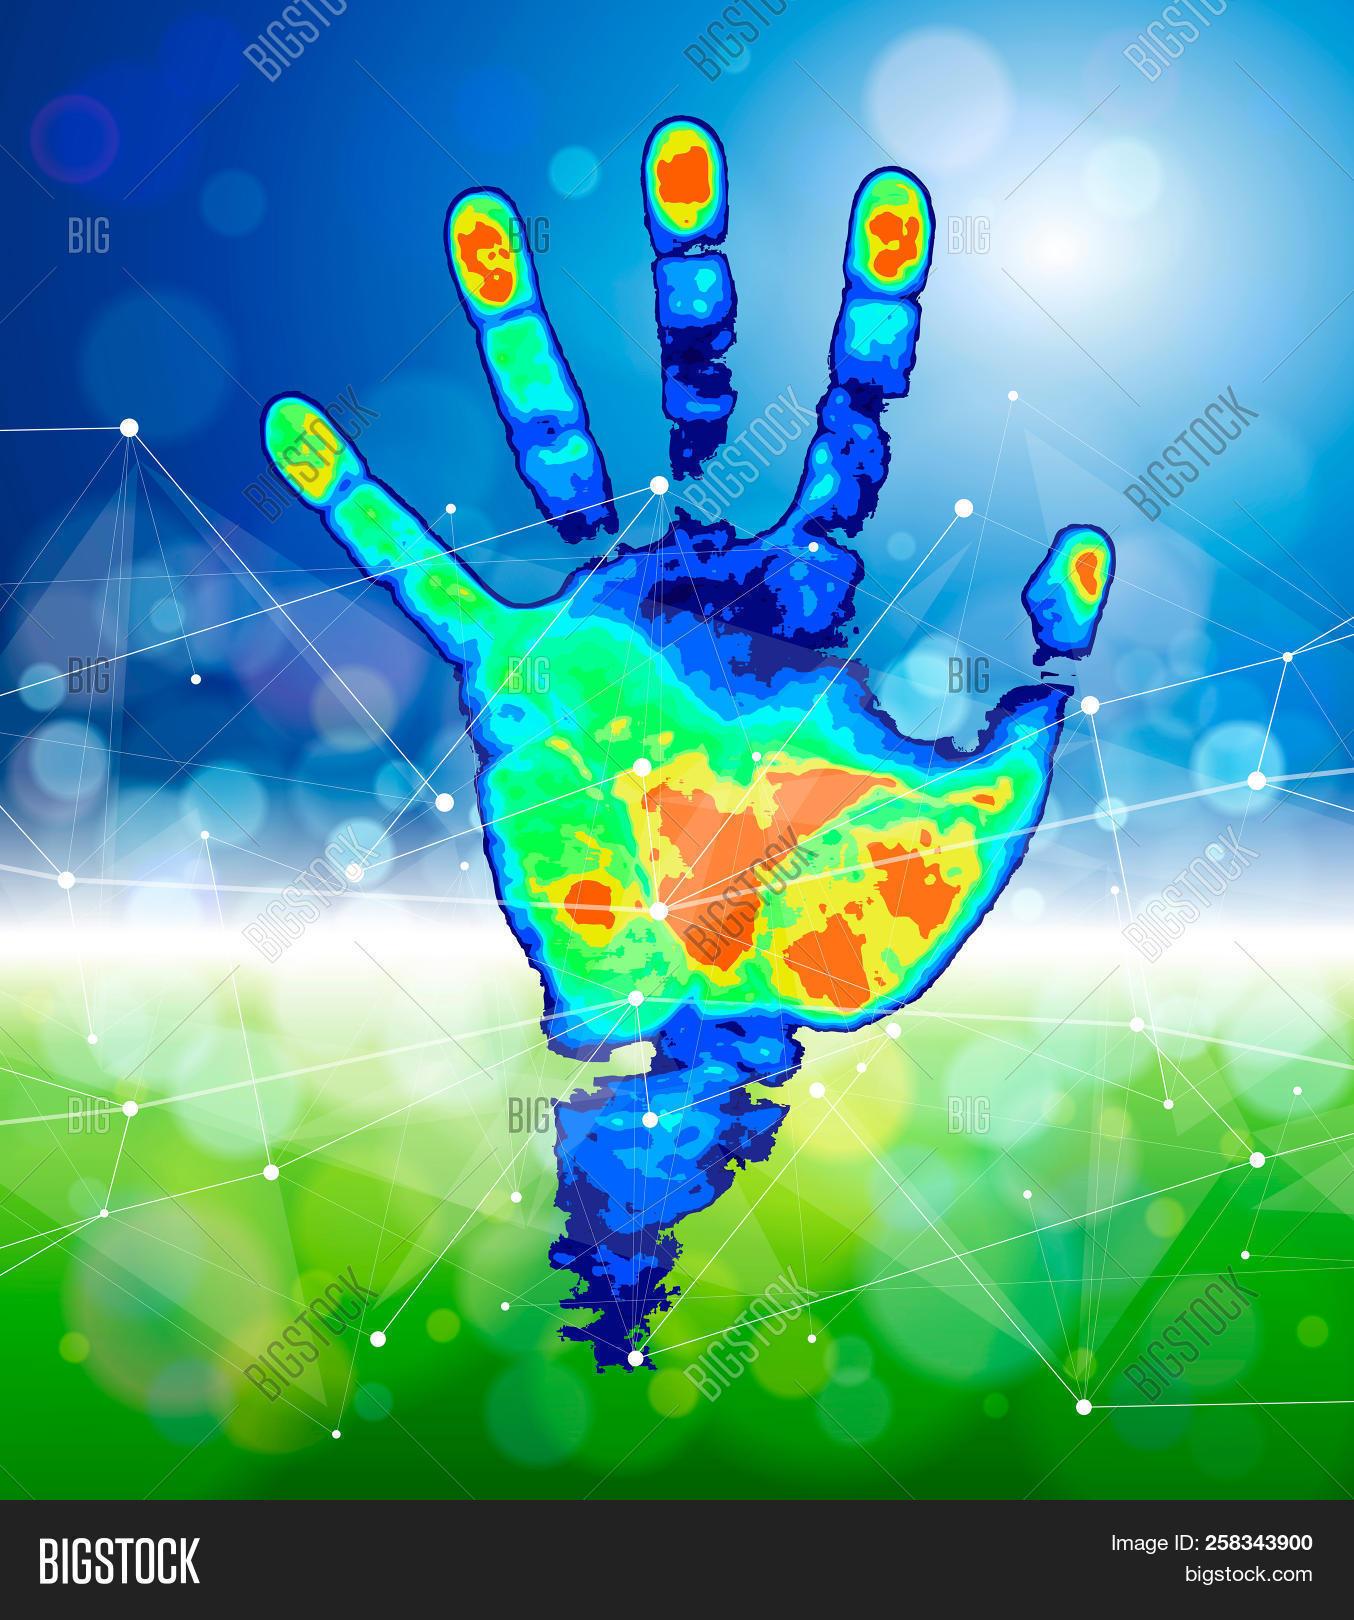 Concept Digital Image Photo Free Trial Bigstock